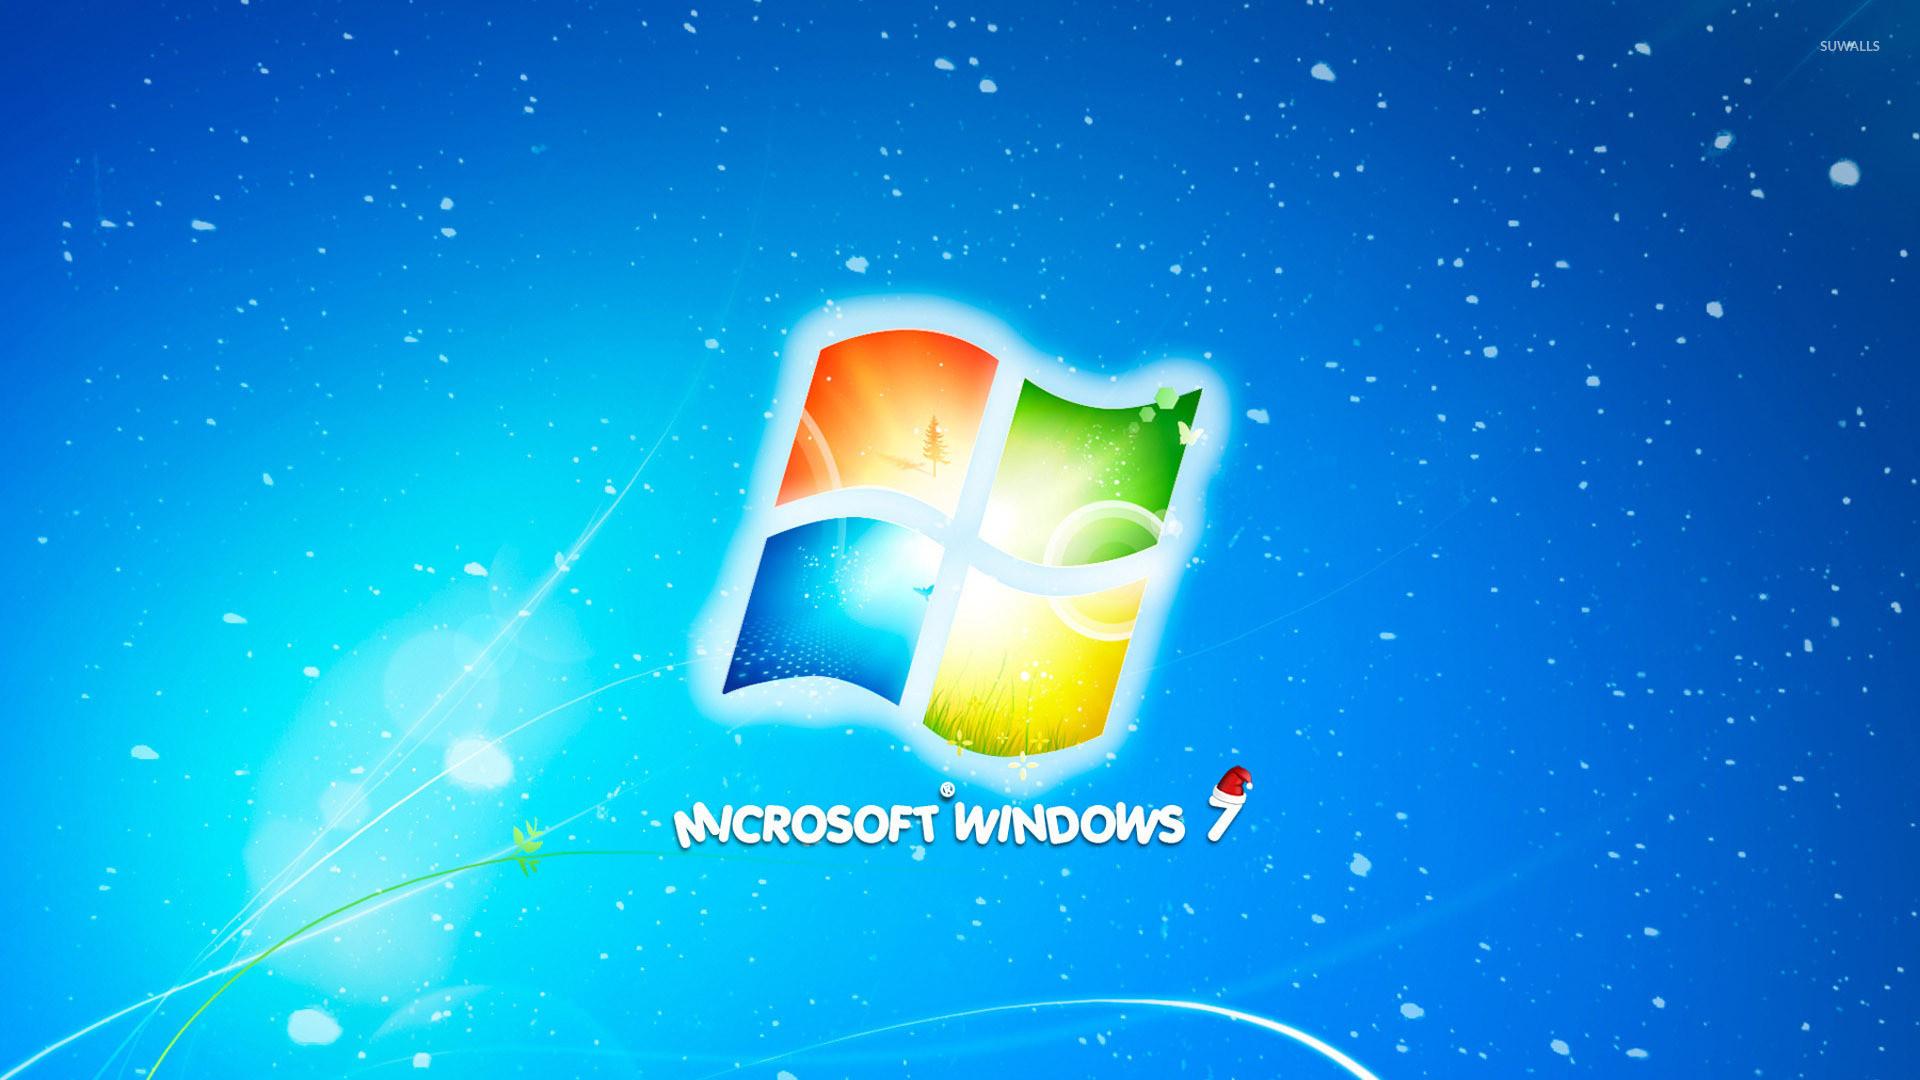 … christmas windows wallpaper; windows 8 made from blue bricks wallpaper  computer wallpapers …